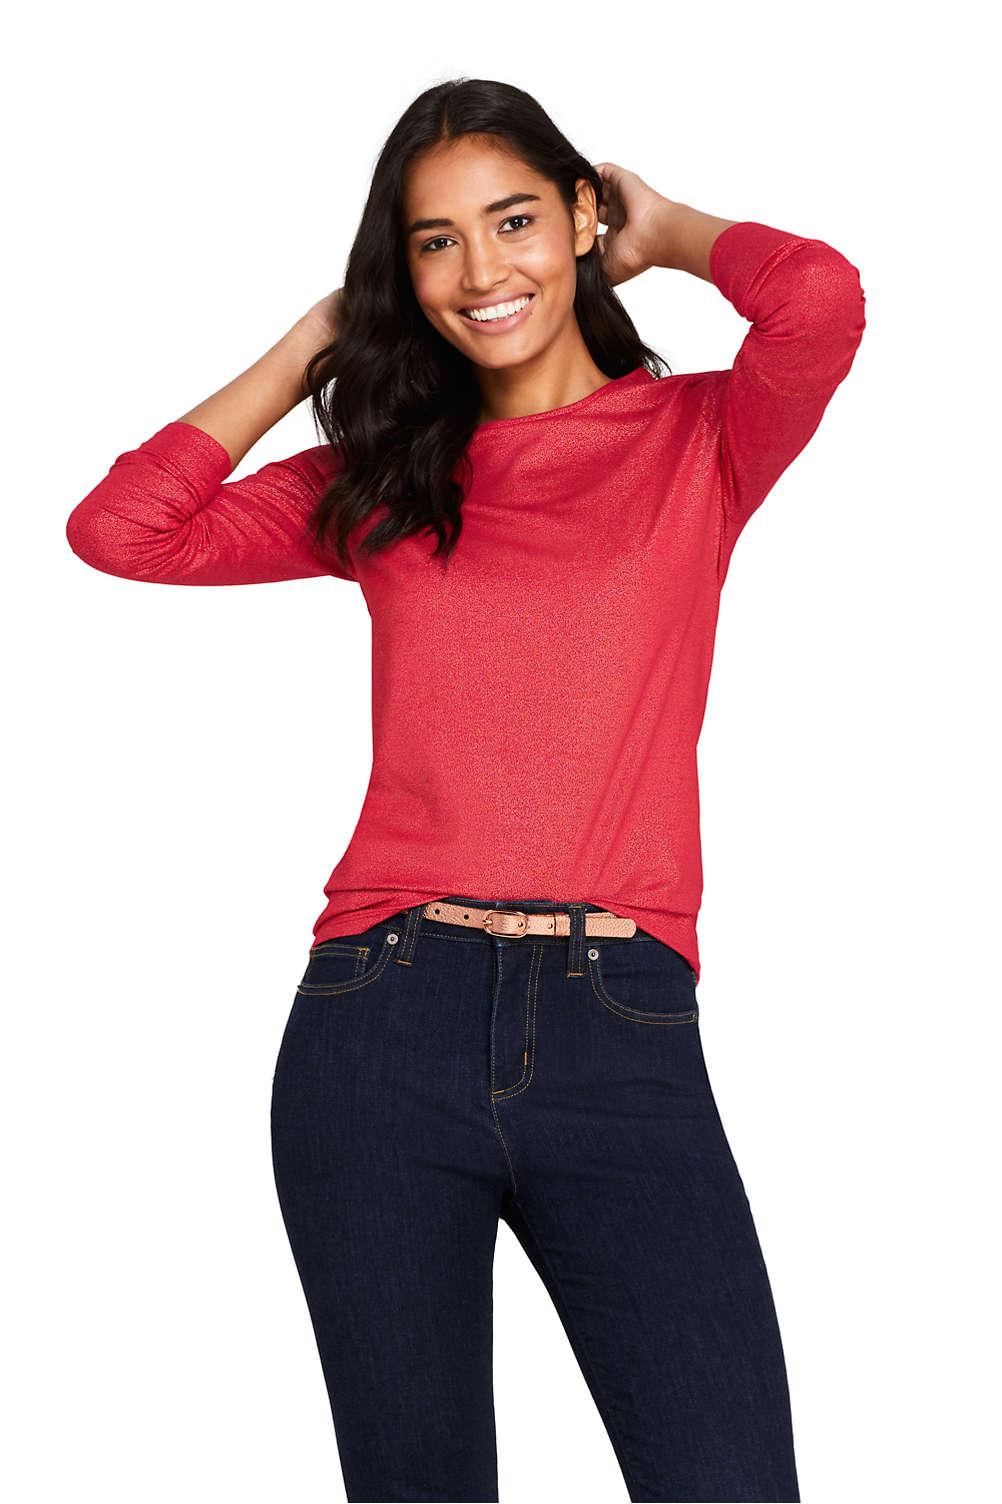 90569554939c Women's Long Sleeve Christmas T-shirt Metallic Foil from Lands' End